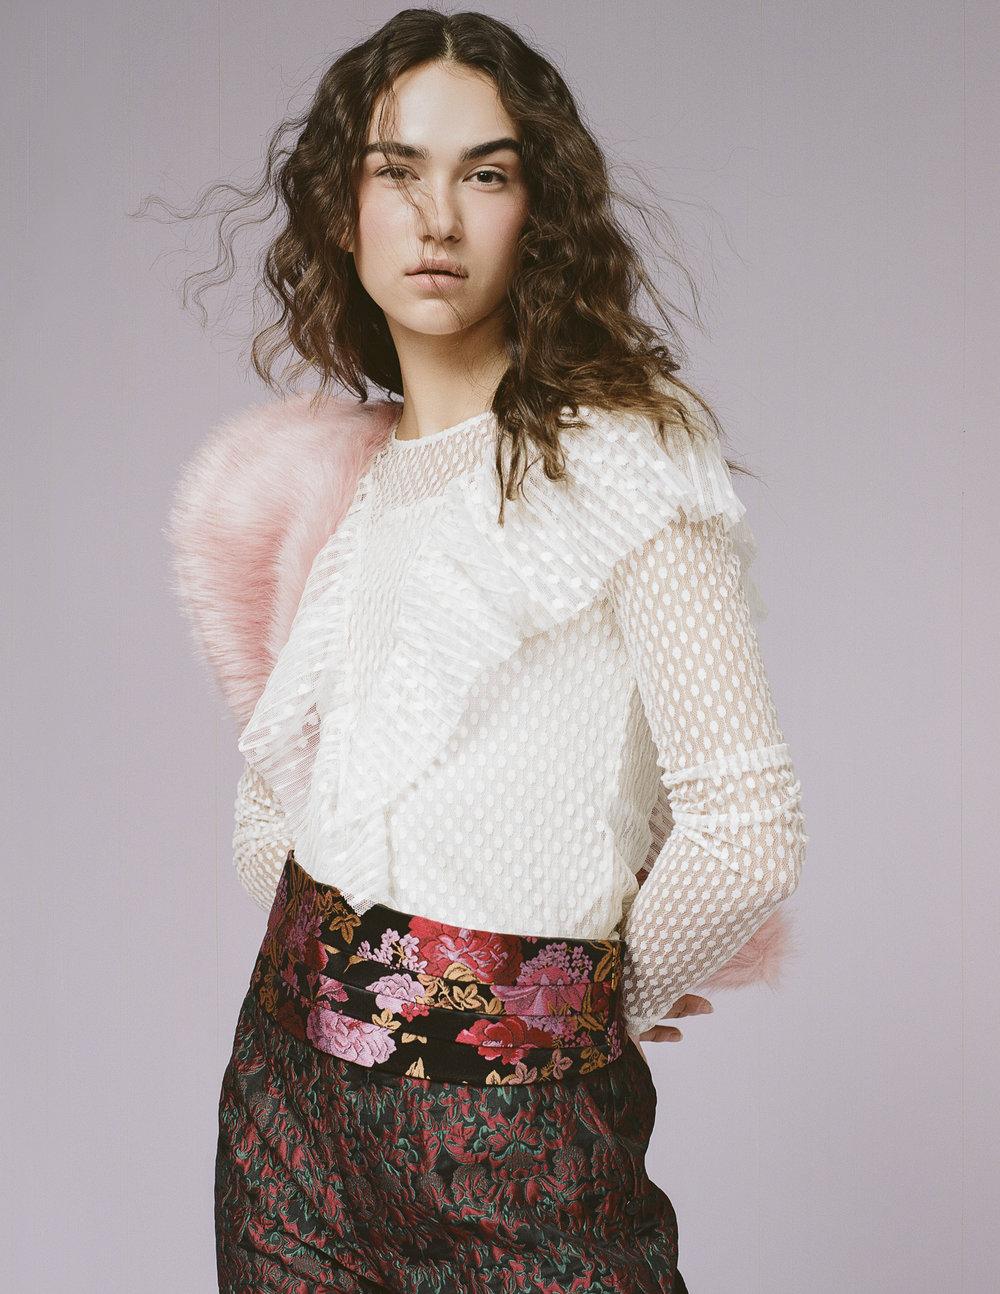 Toronto Fashion Portrait Photographer